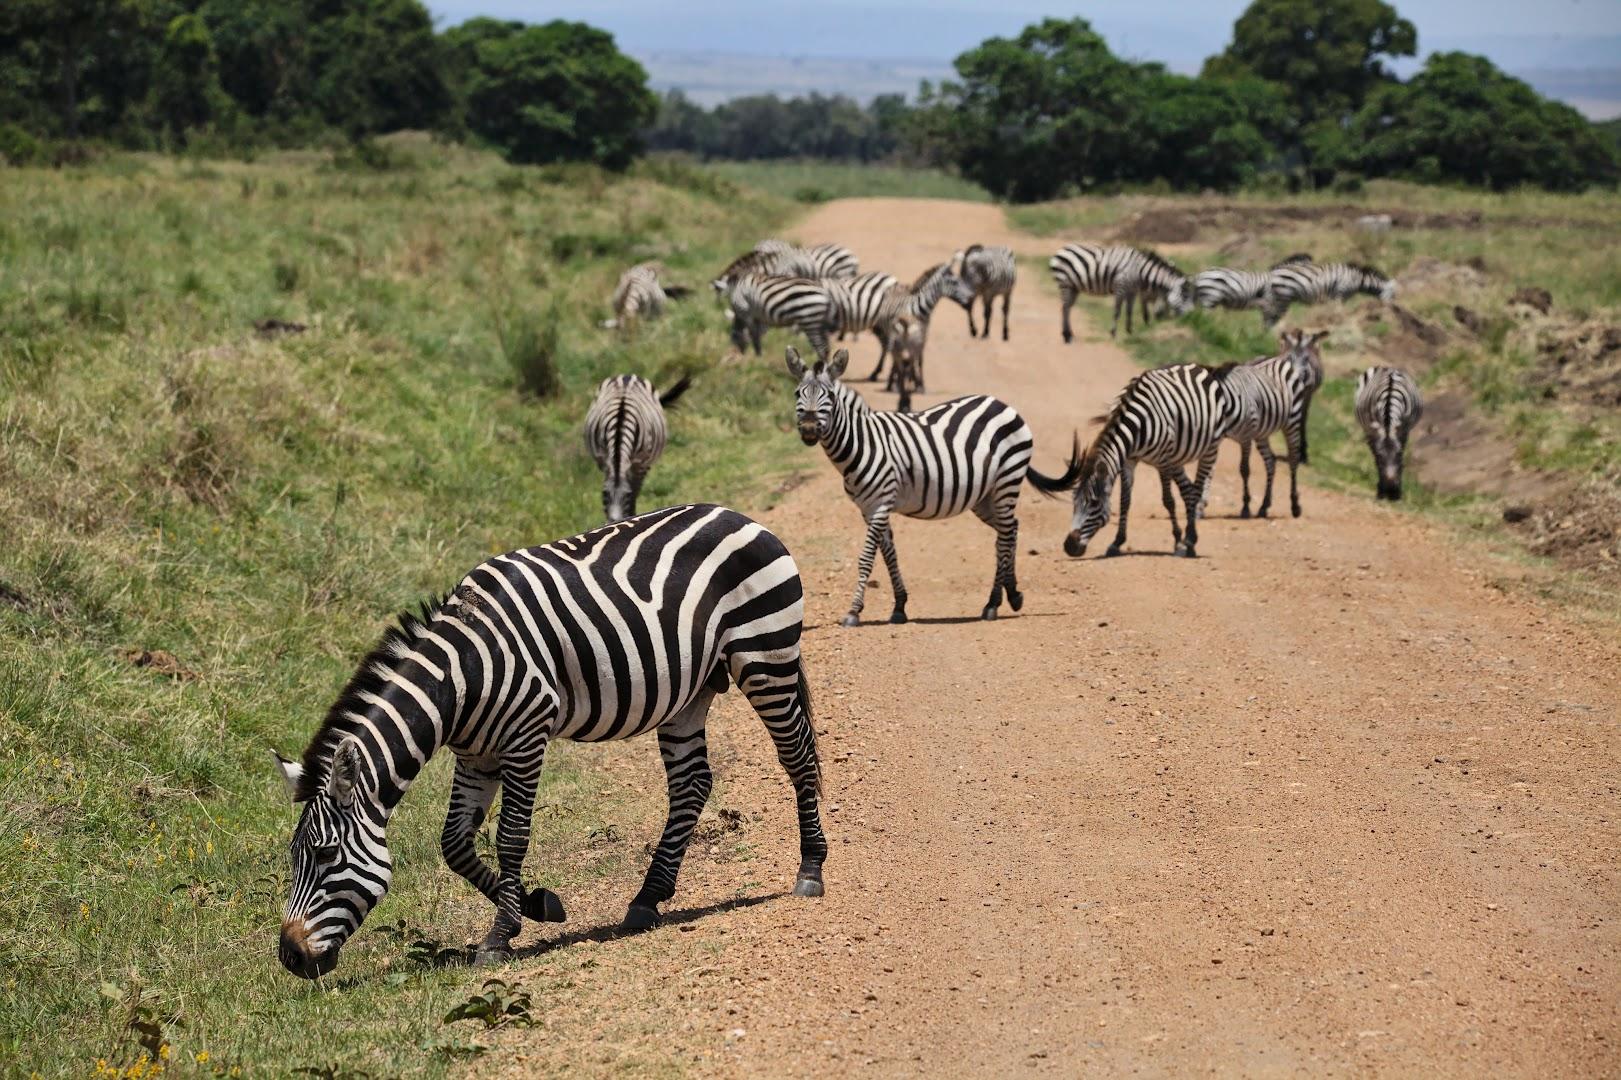 Roadblock, African style